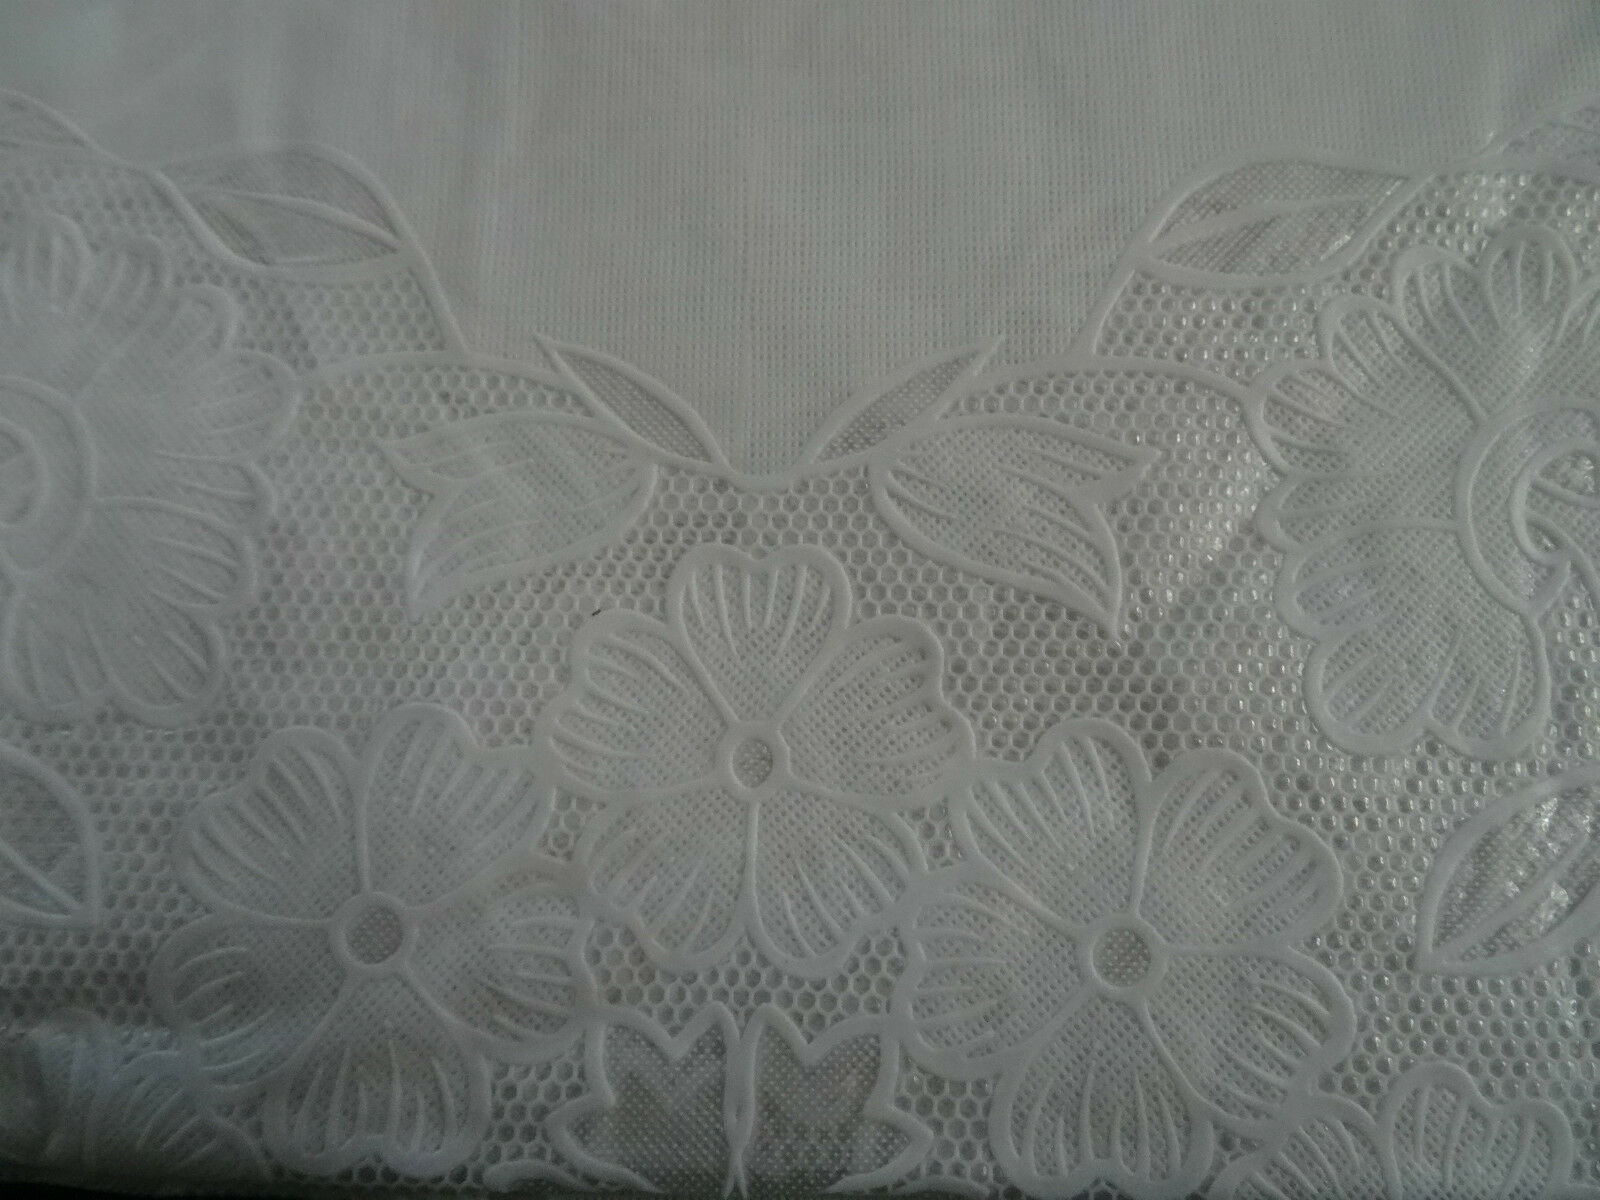 150x260 Cm White Rectangular Tablecloth Vinyl Tablecloth